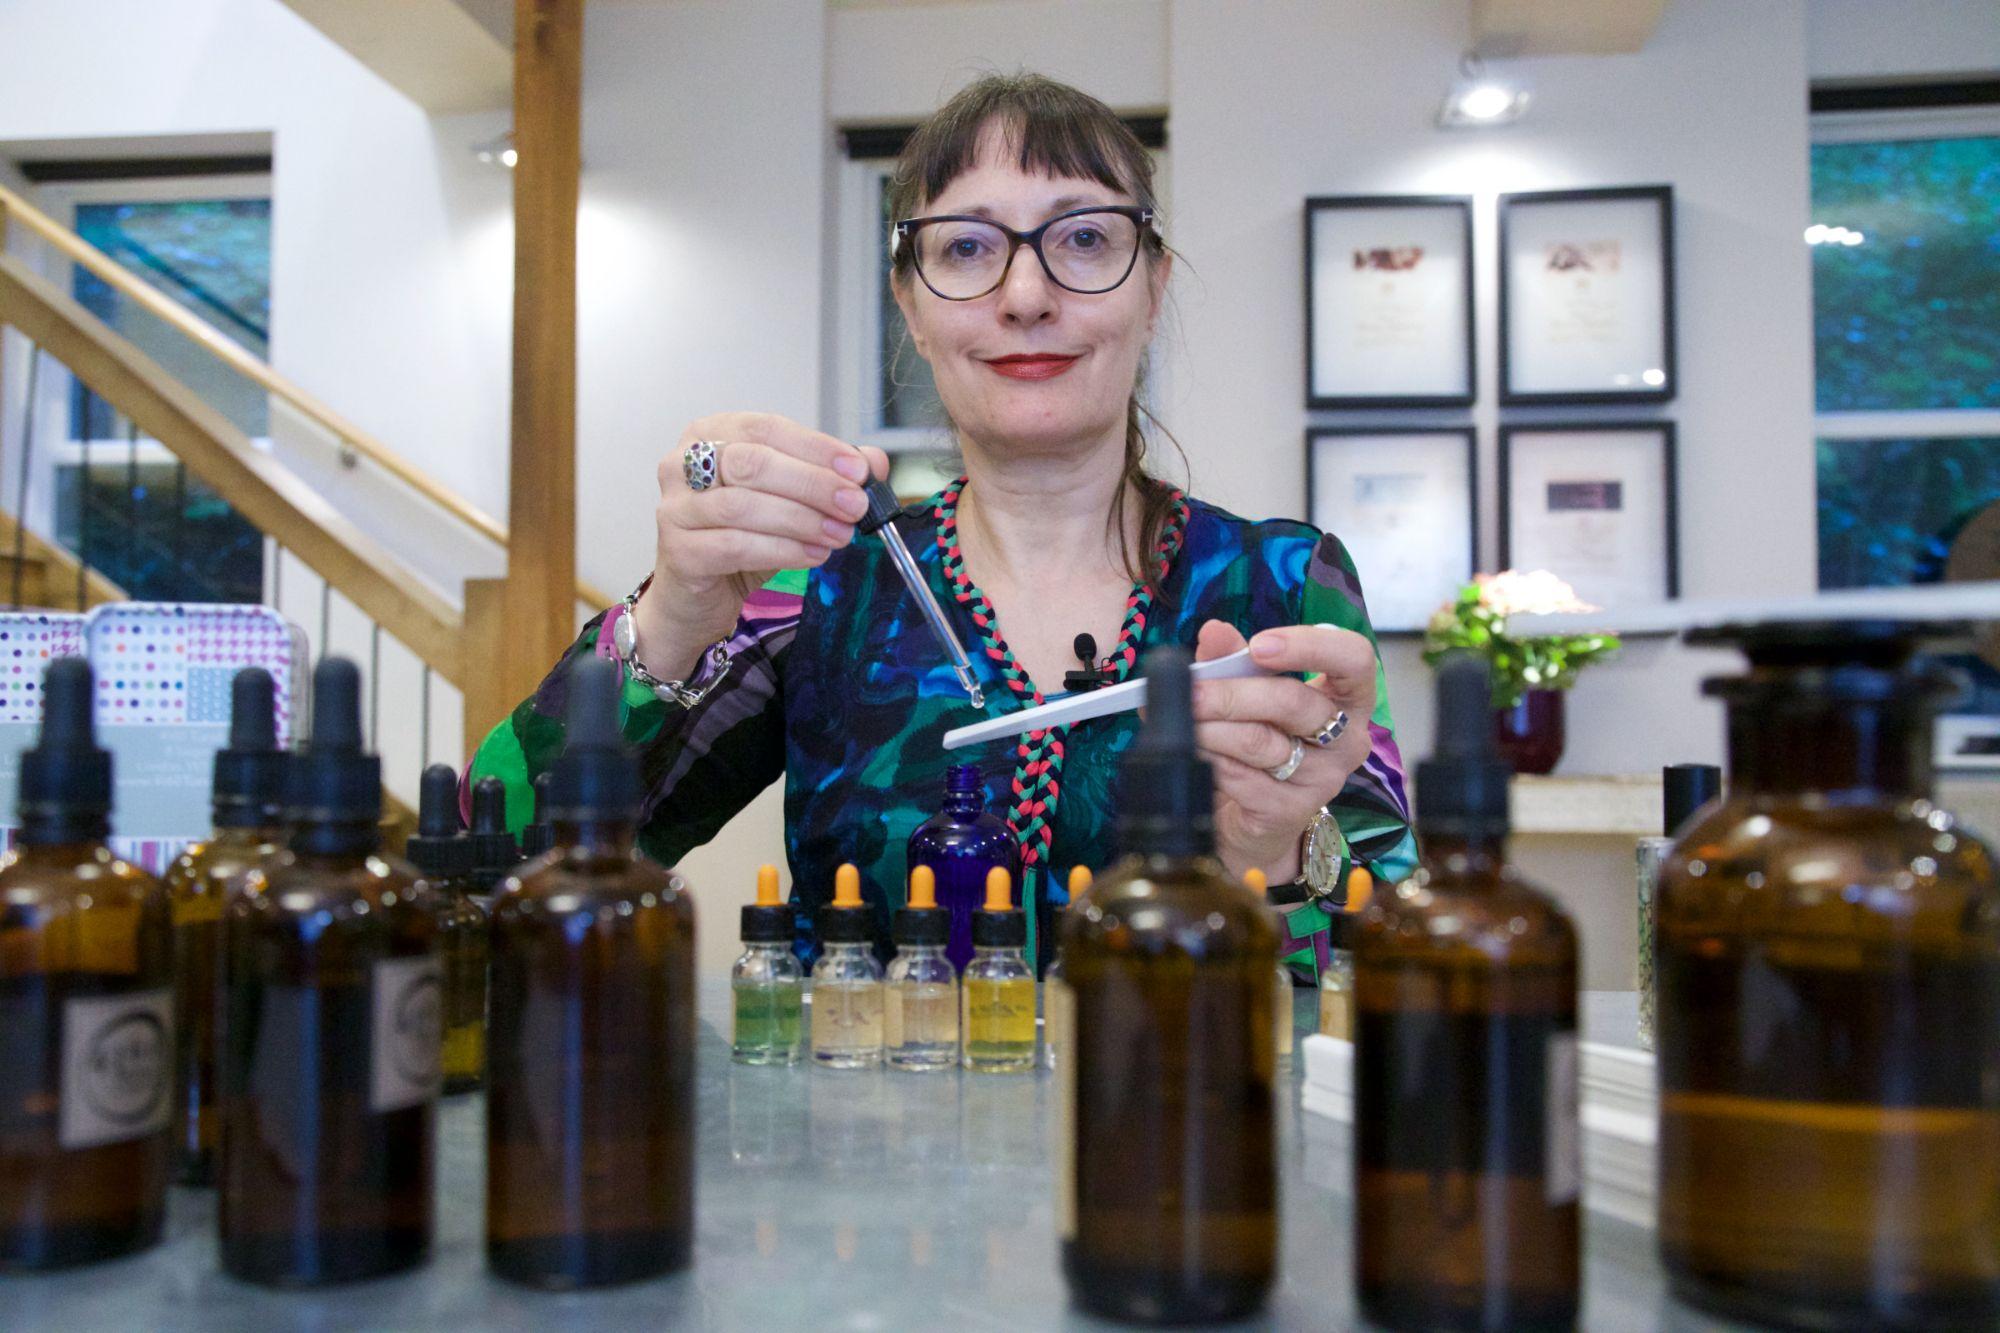 Perfumer Sarah McCartney posing with bottles of perfume materials